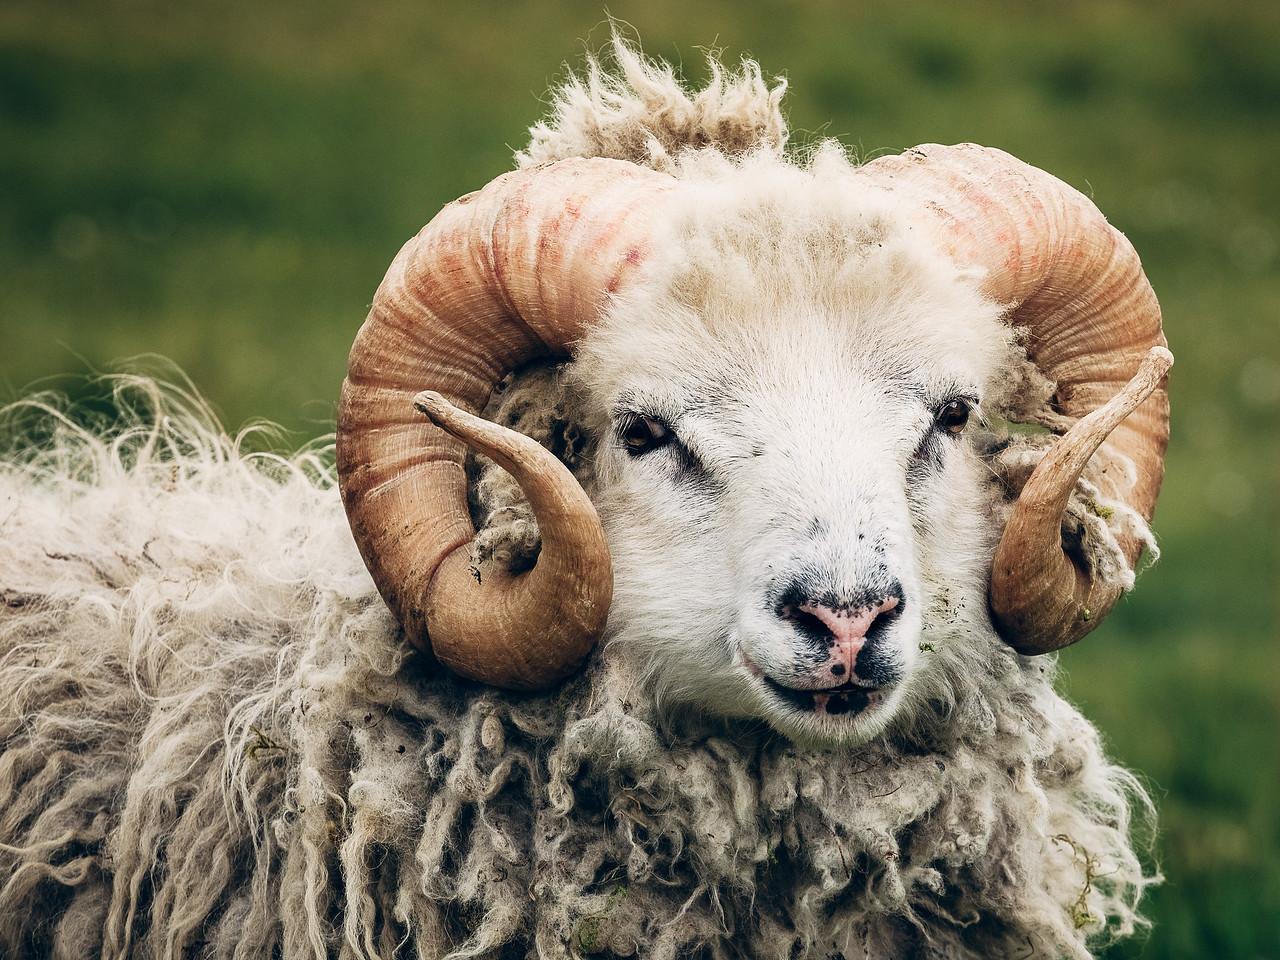 Faroese Sheep